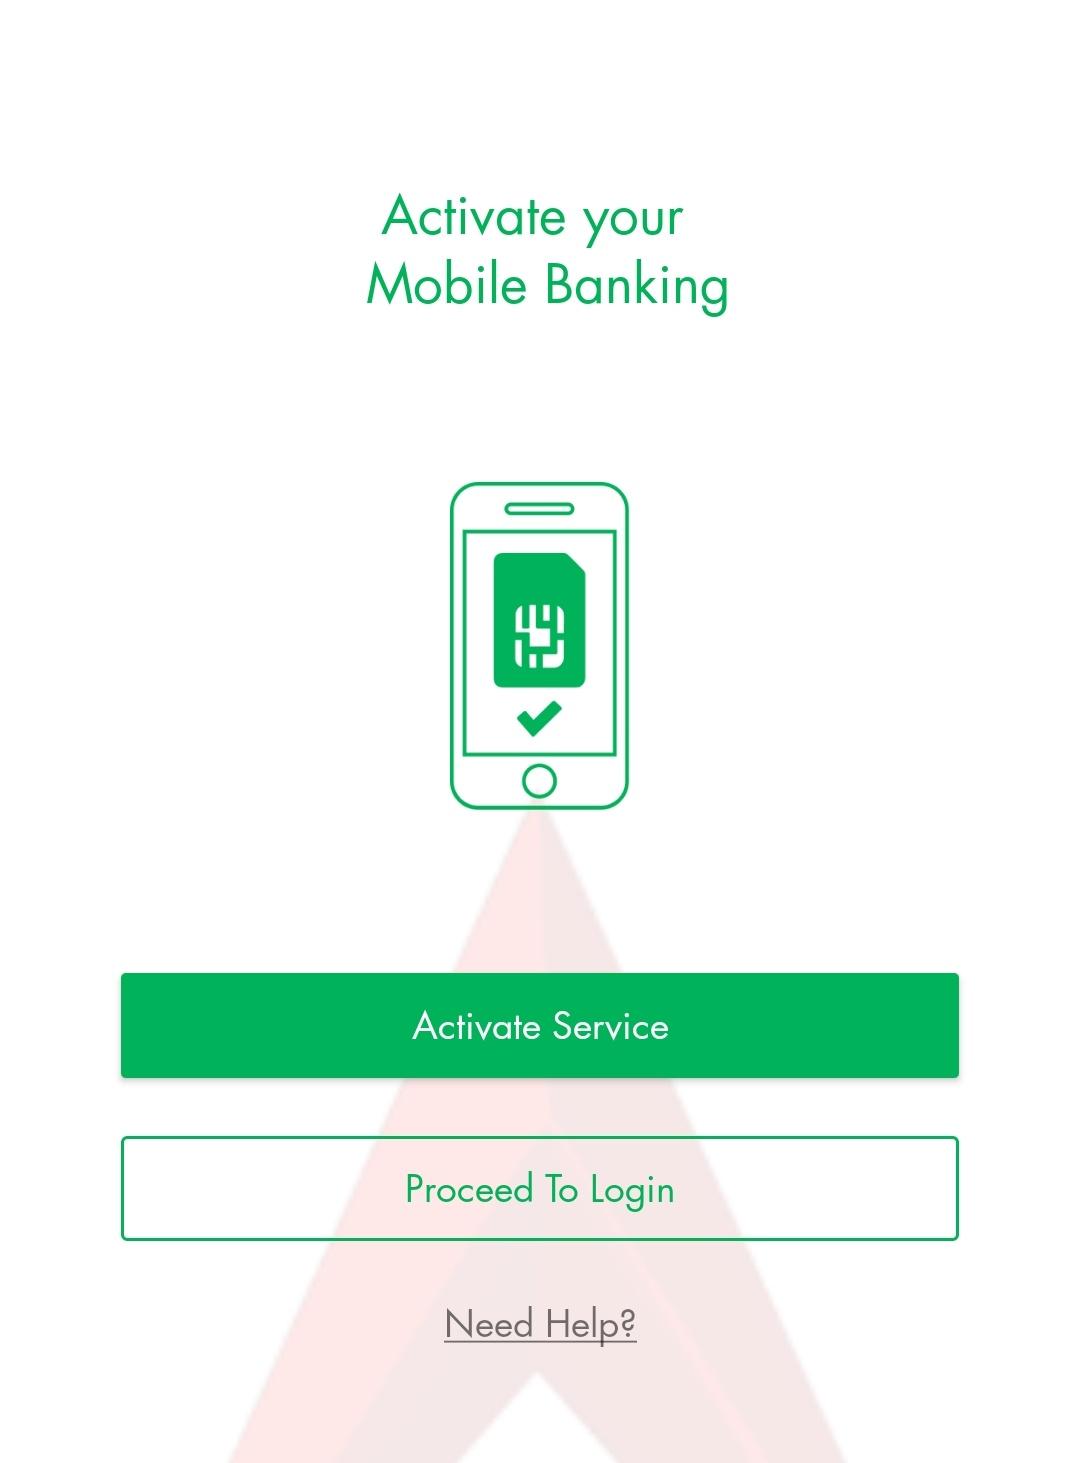 Nabil Smart Bank activate